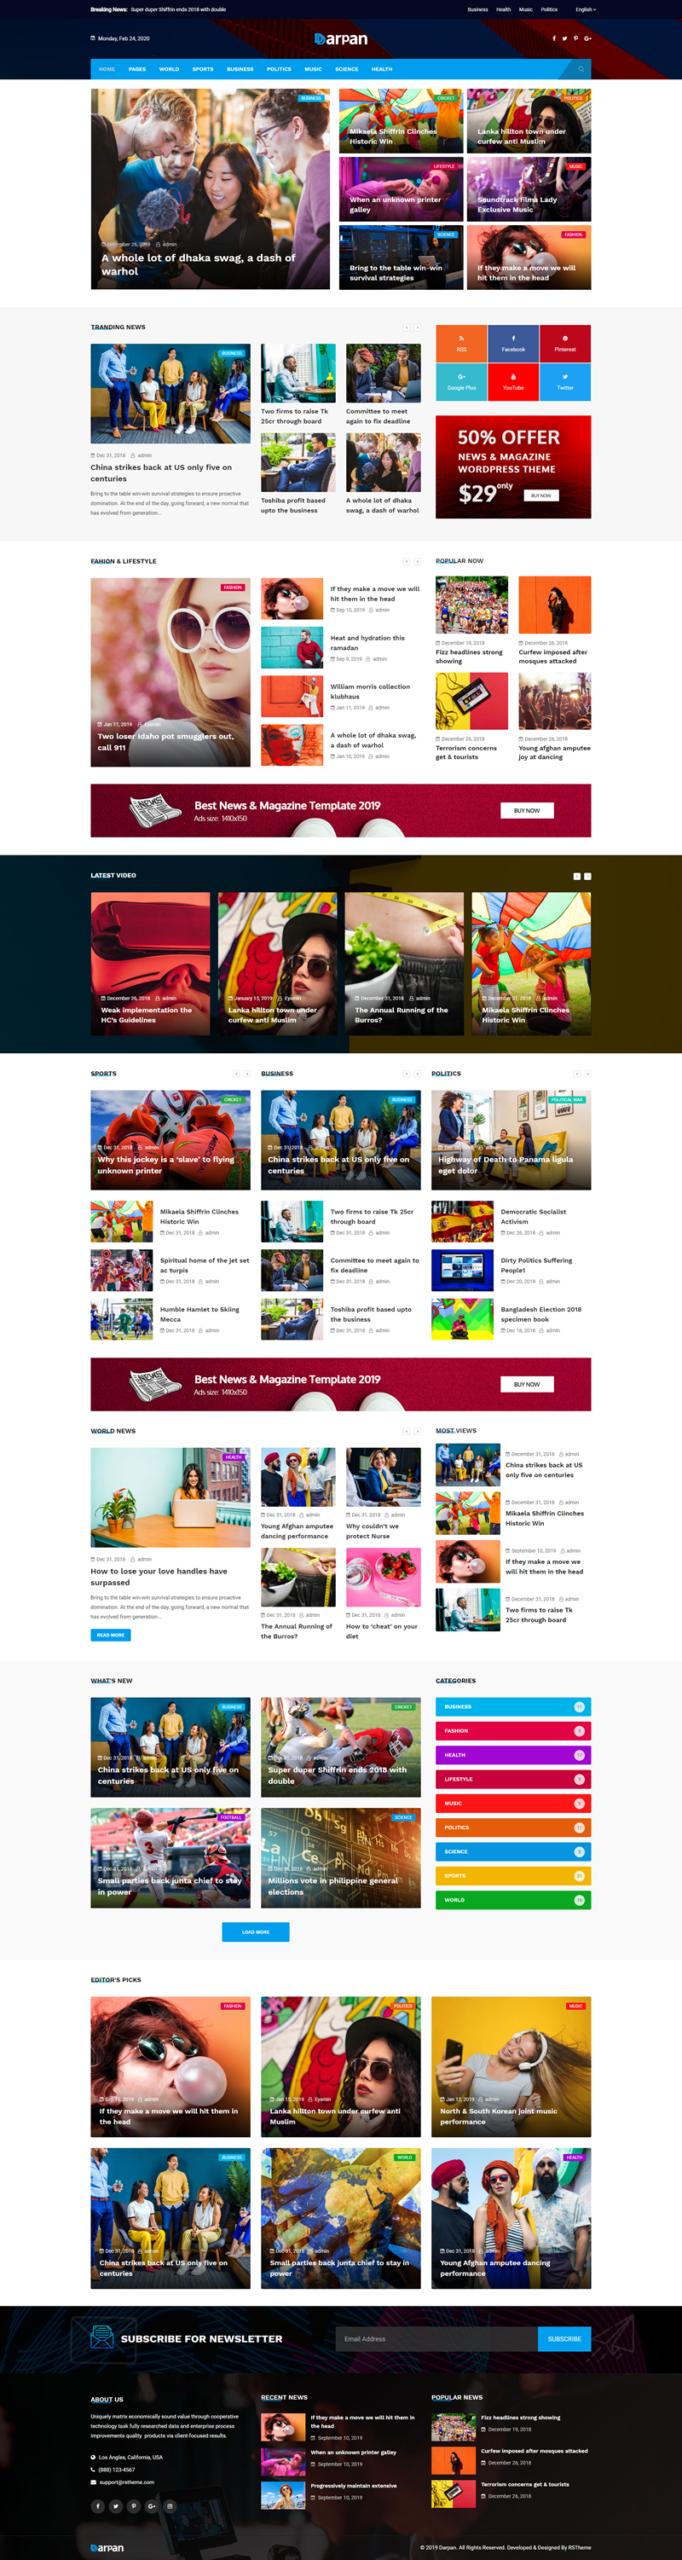 Darpan - WordPress theme